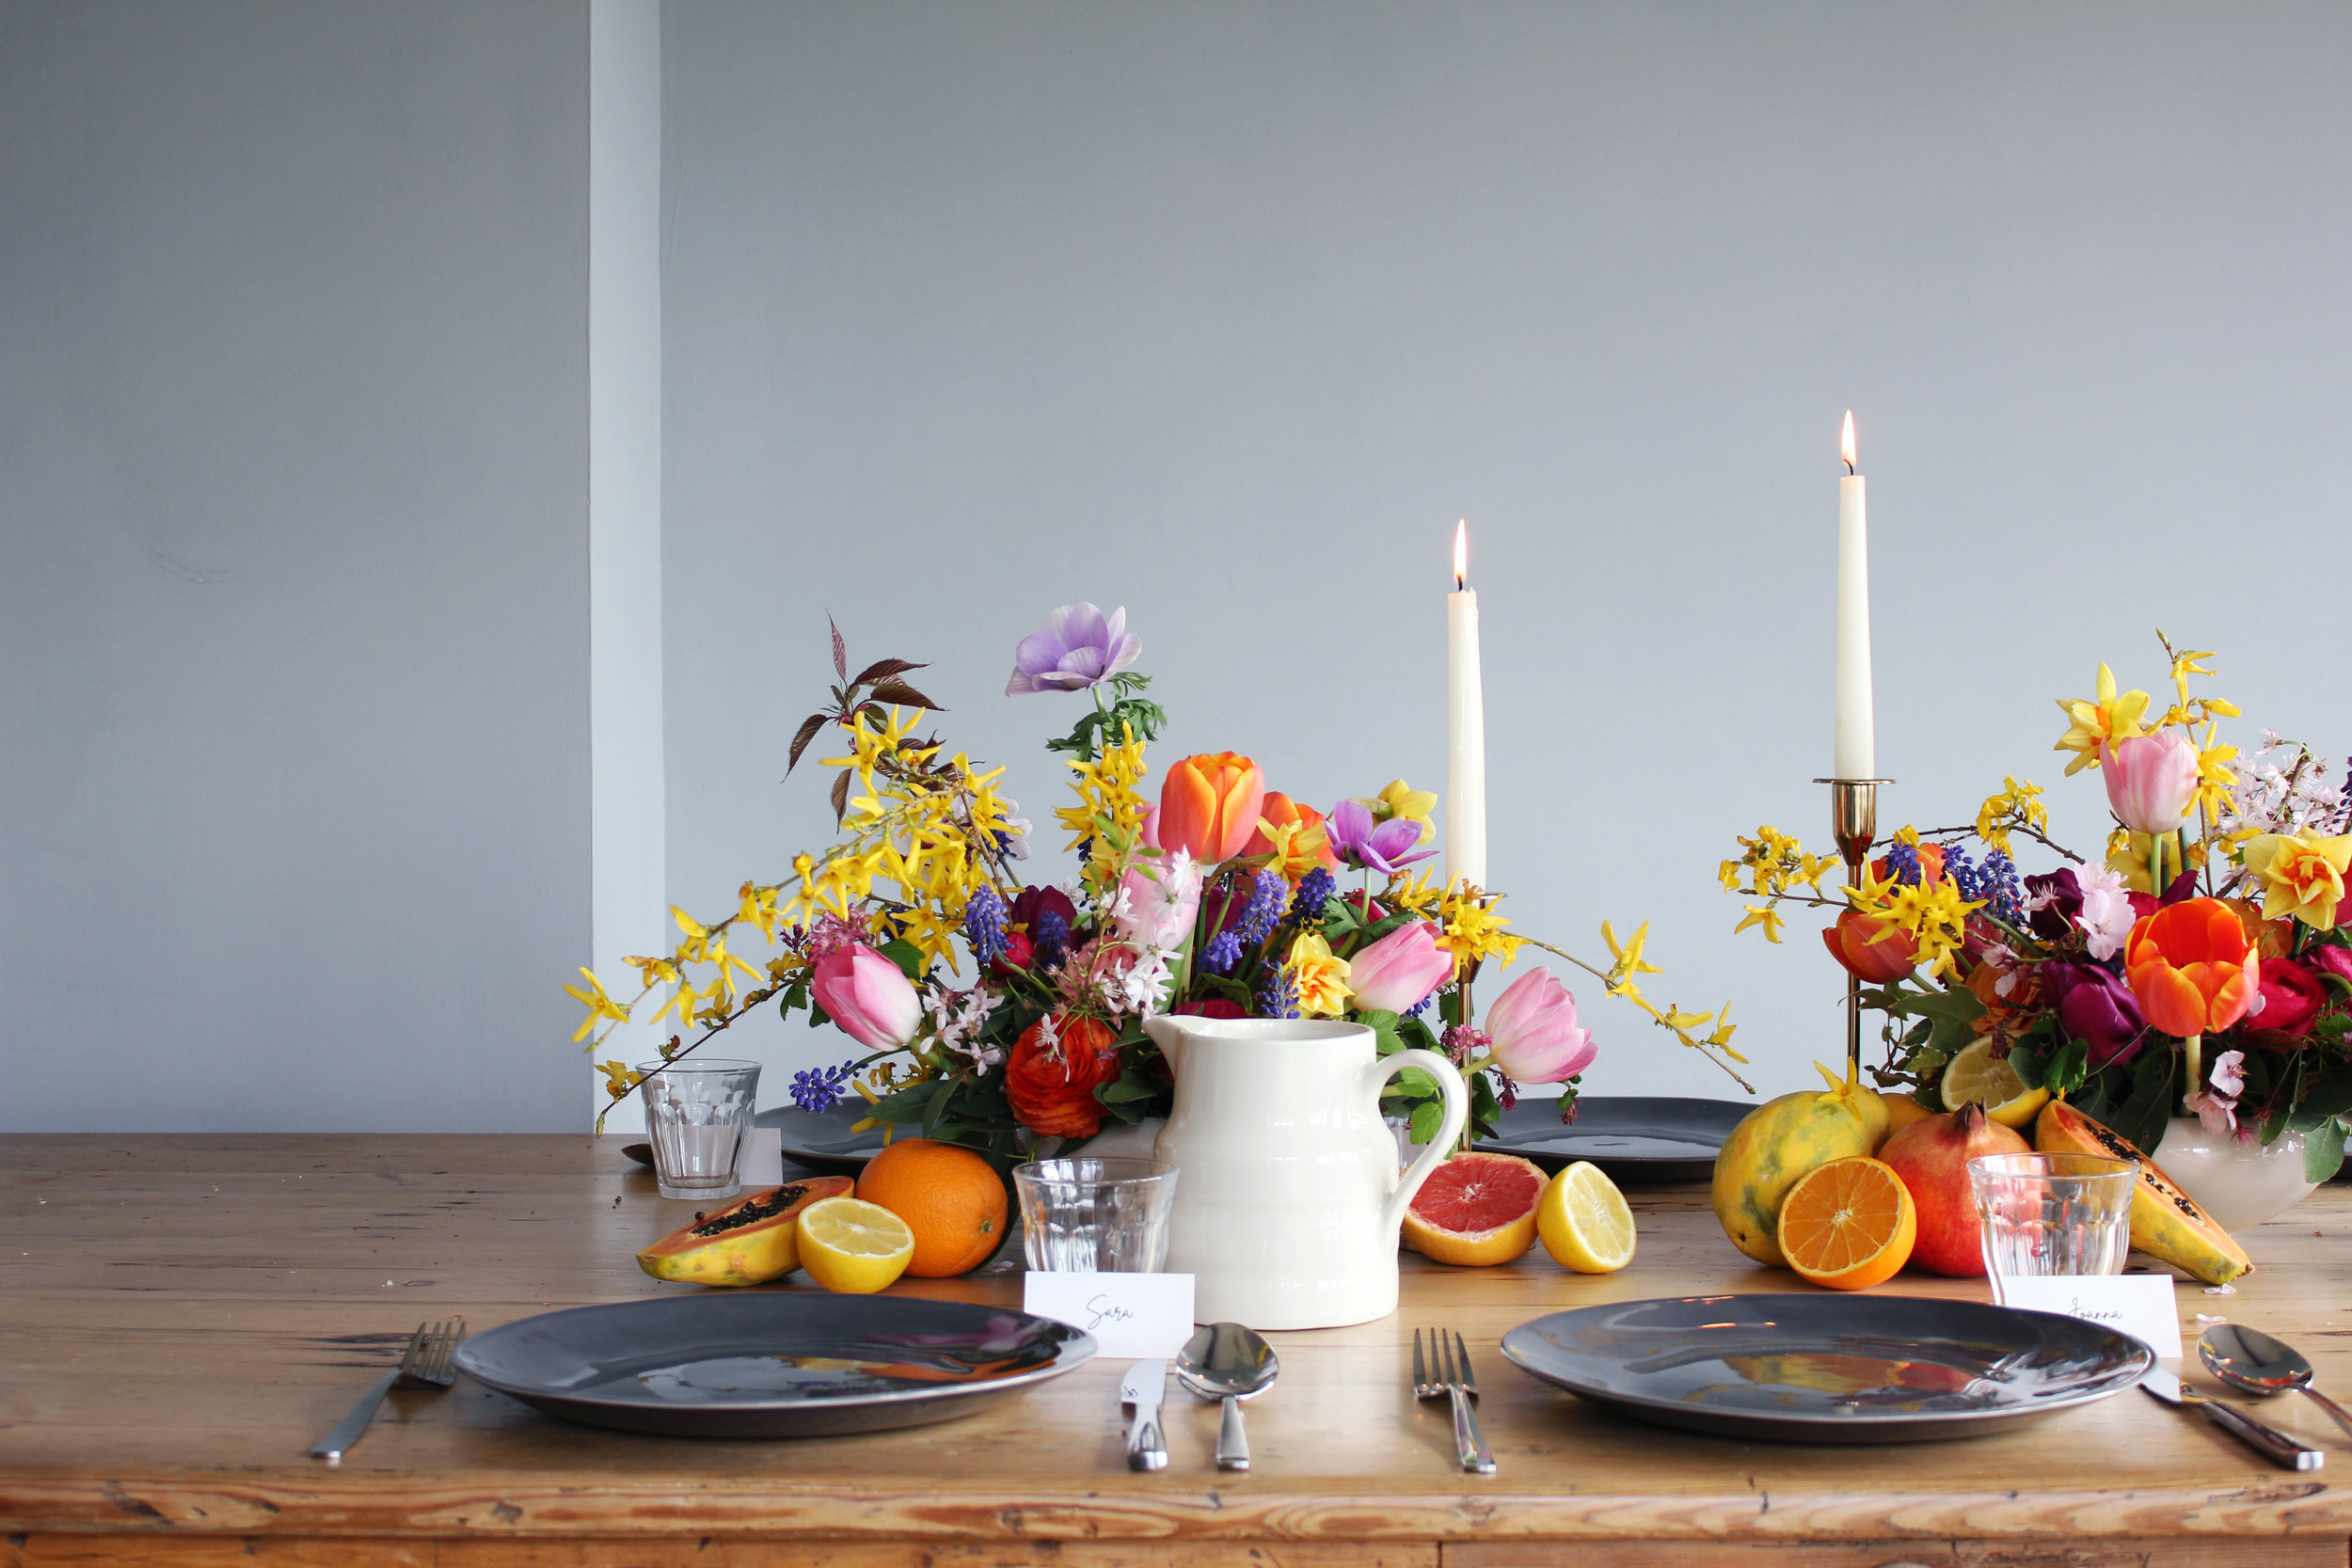 Callie-Pettigrew-Fruity-Florals-10.jpg